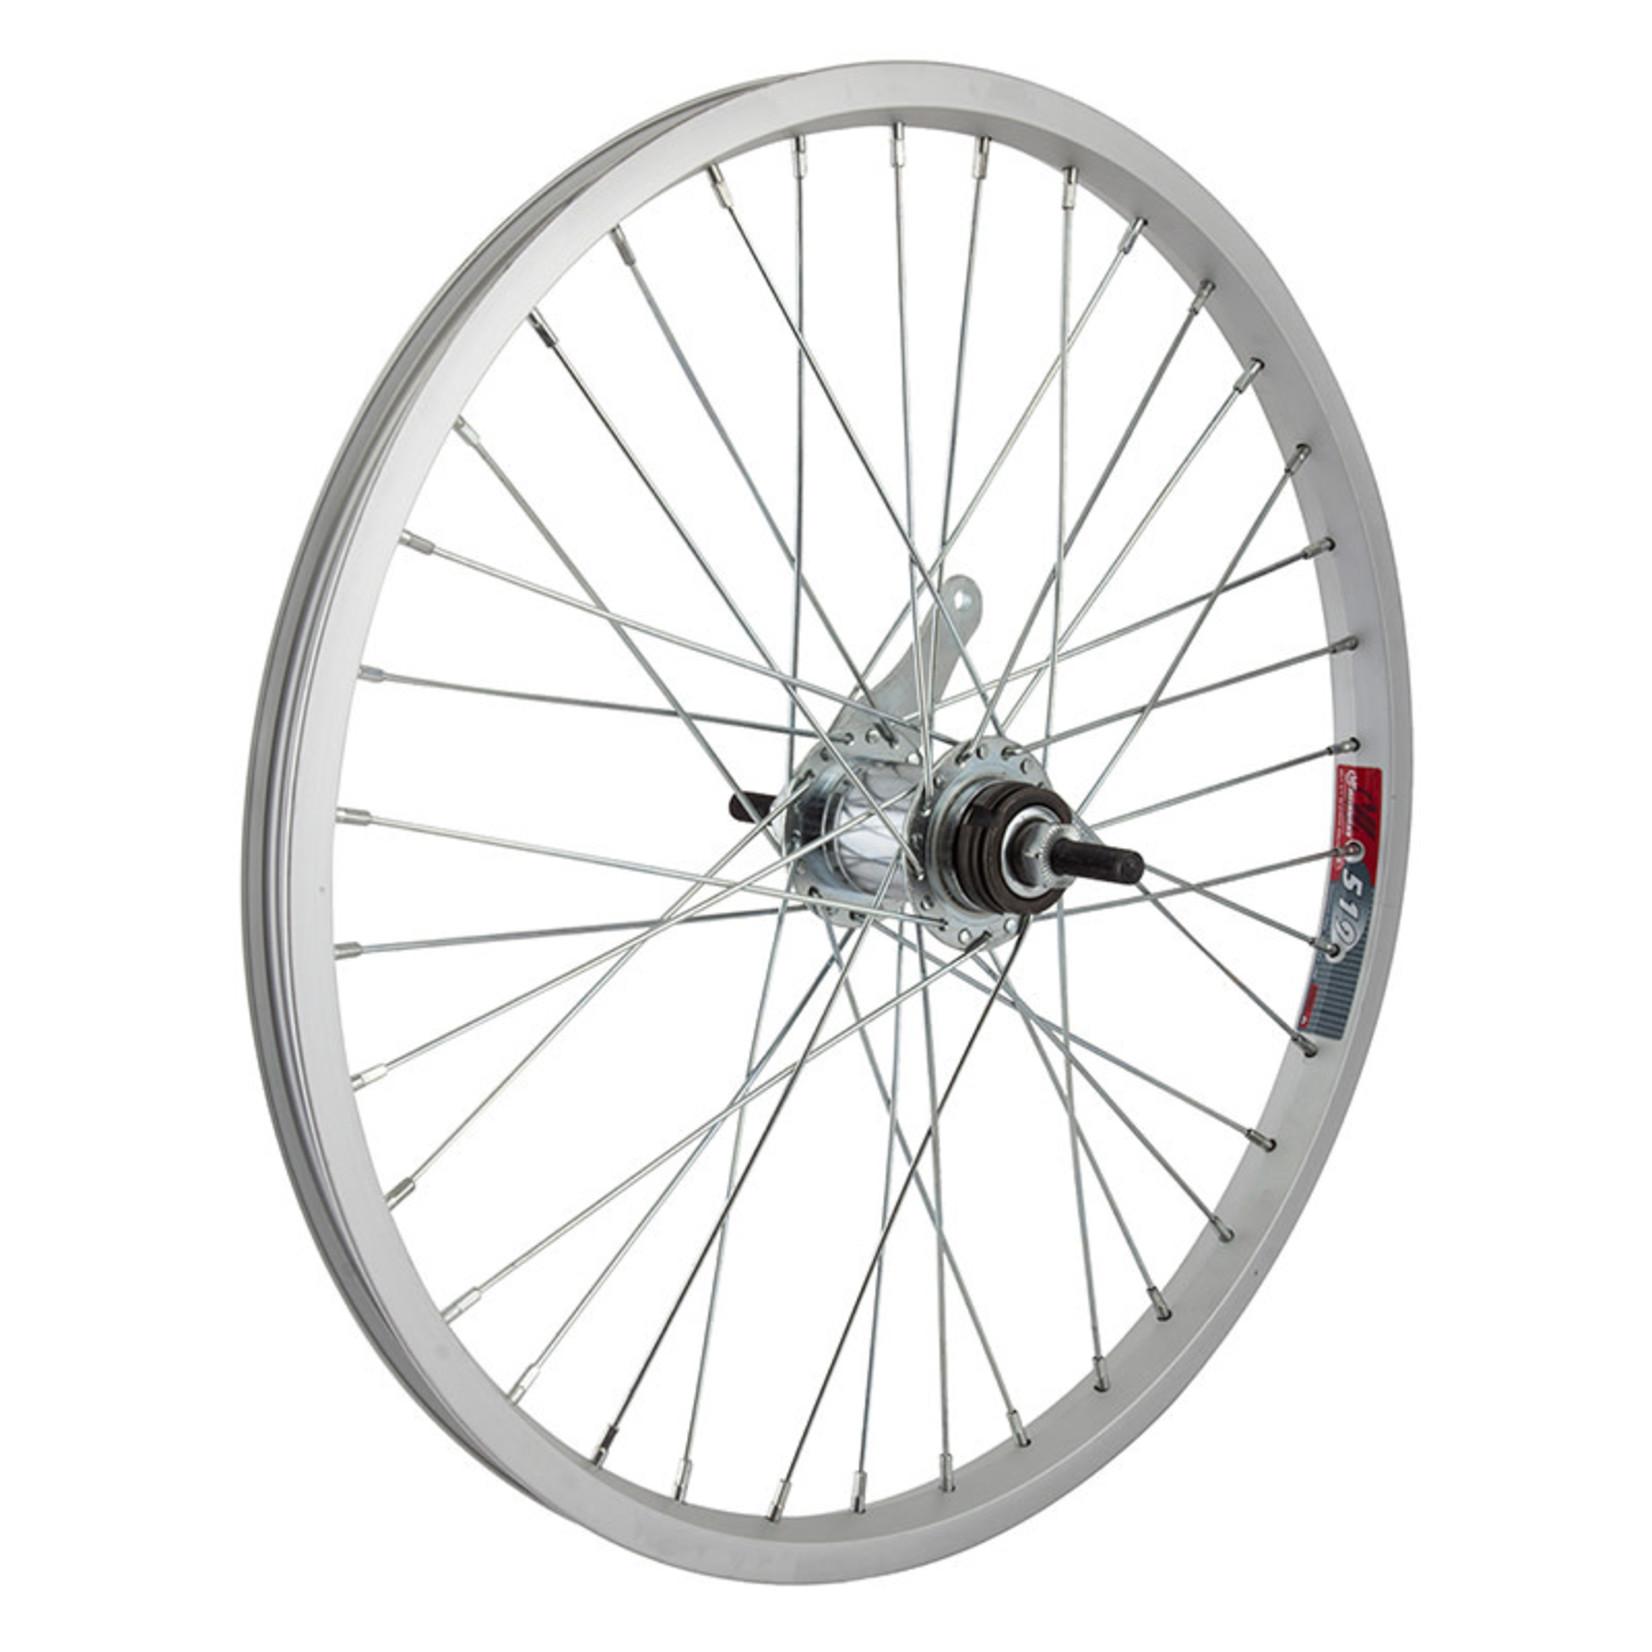 20'' Rear Wheel Coaster Brake Single Wall Silver BO 3/8